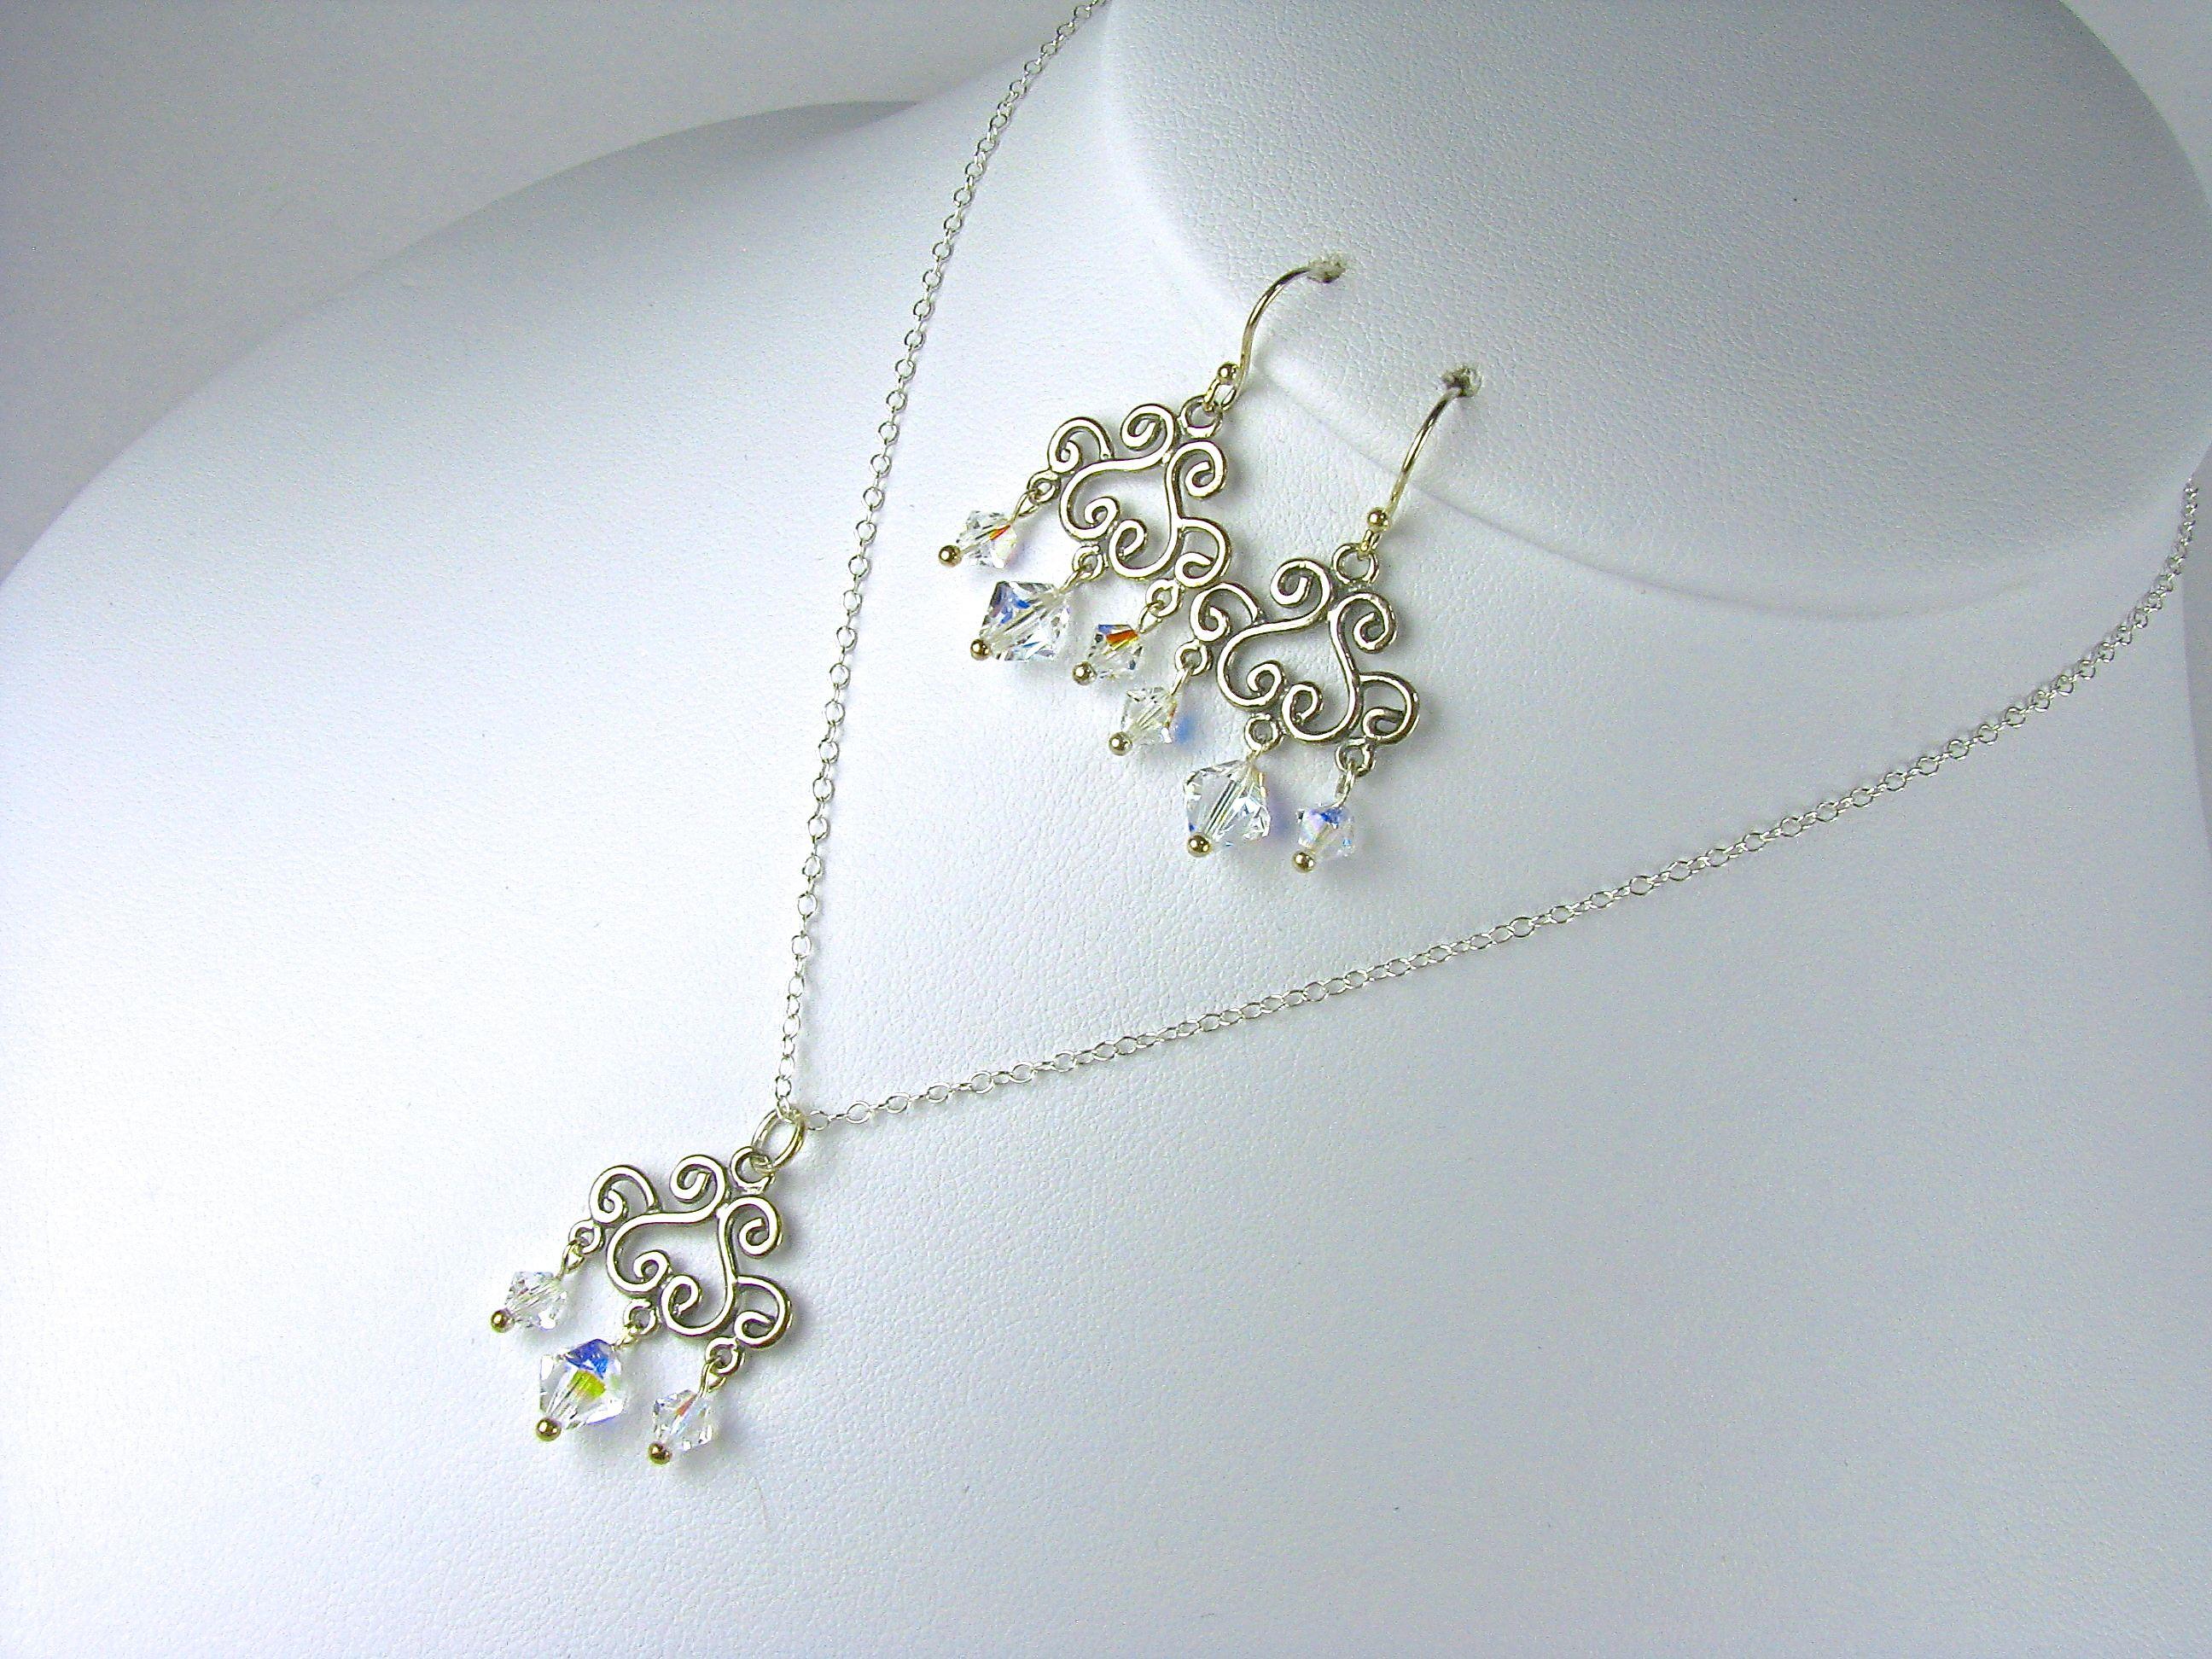 Chandelier Bridesmaids Necklace Set. Solid Sterling Silver Chandelier Swarovski Crystals. Charlotte